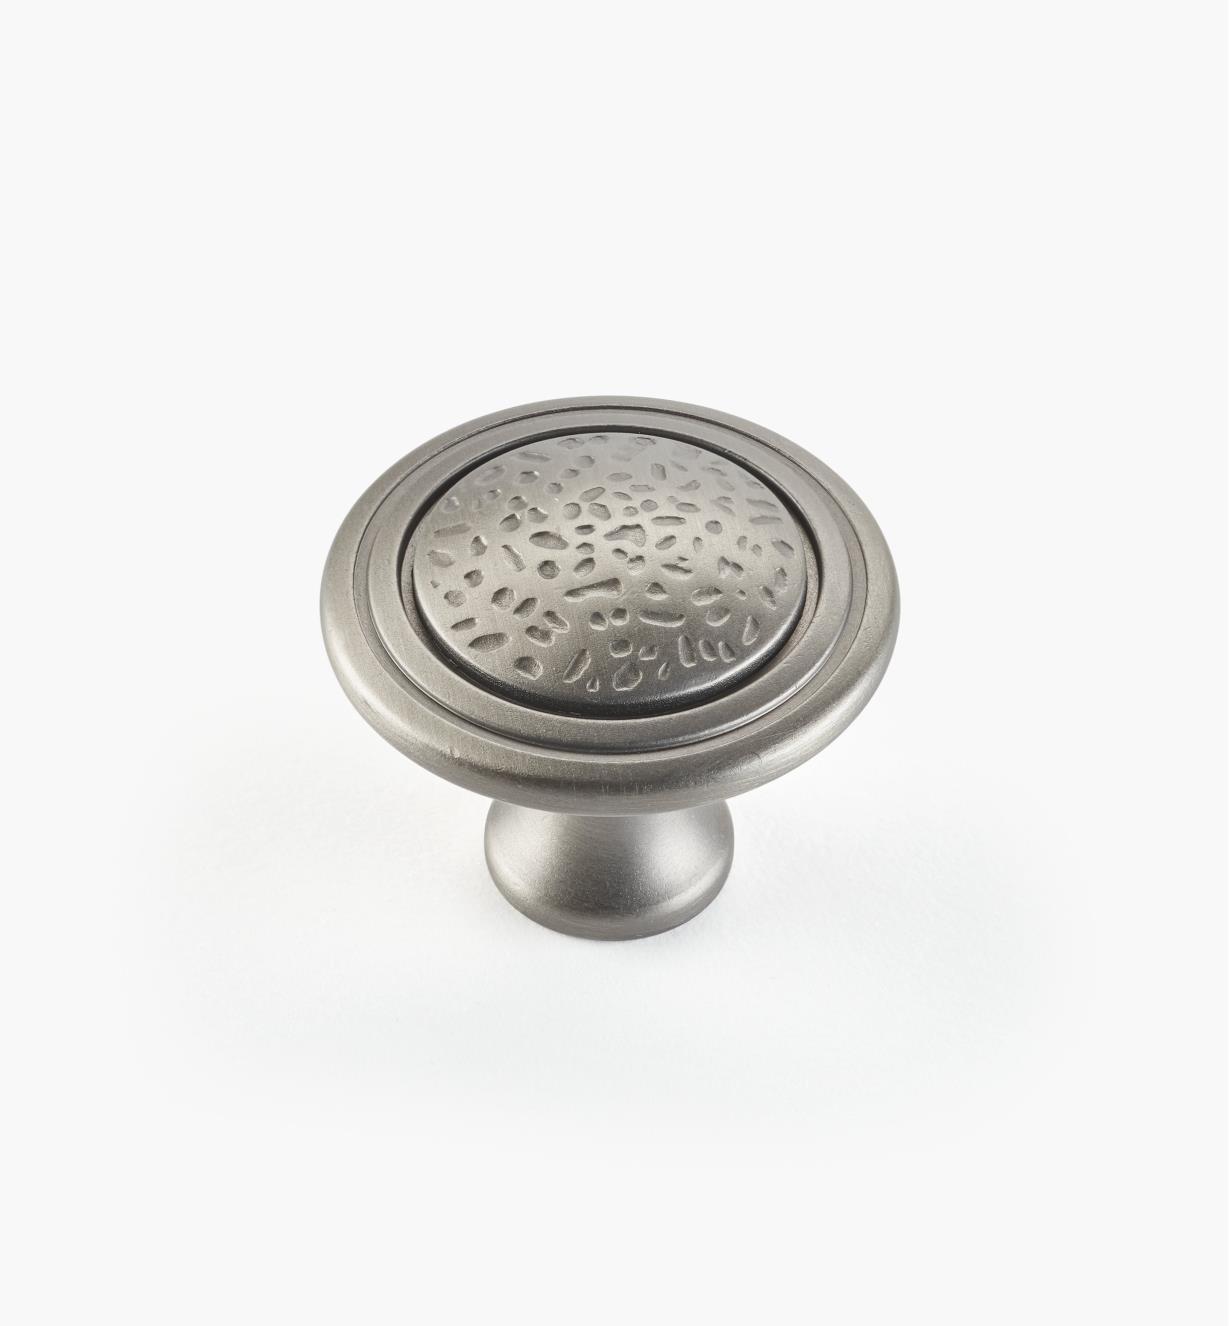 02W4003 - Pewter Knob